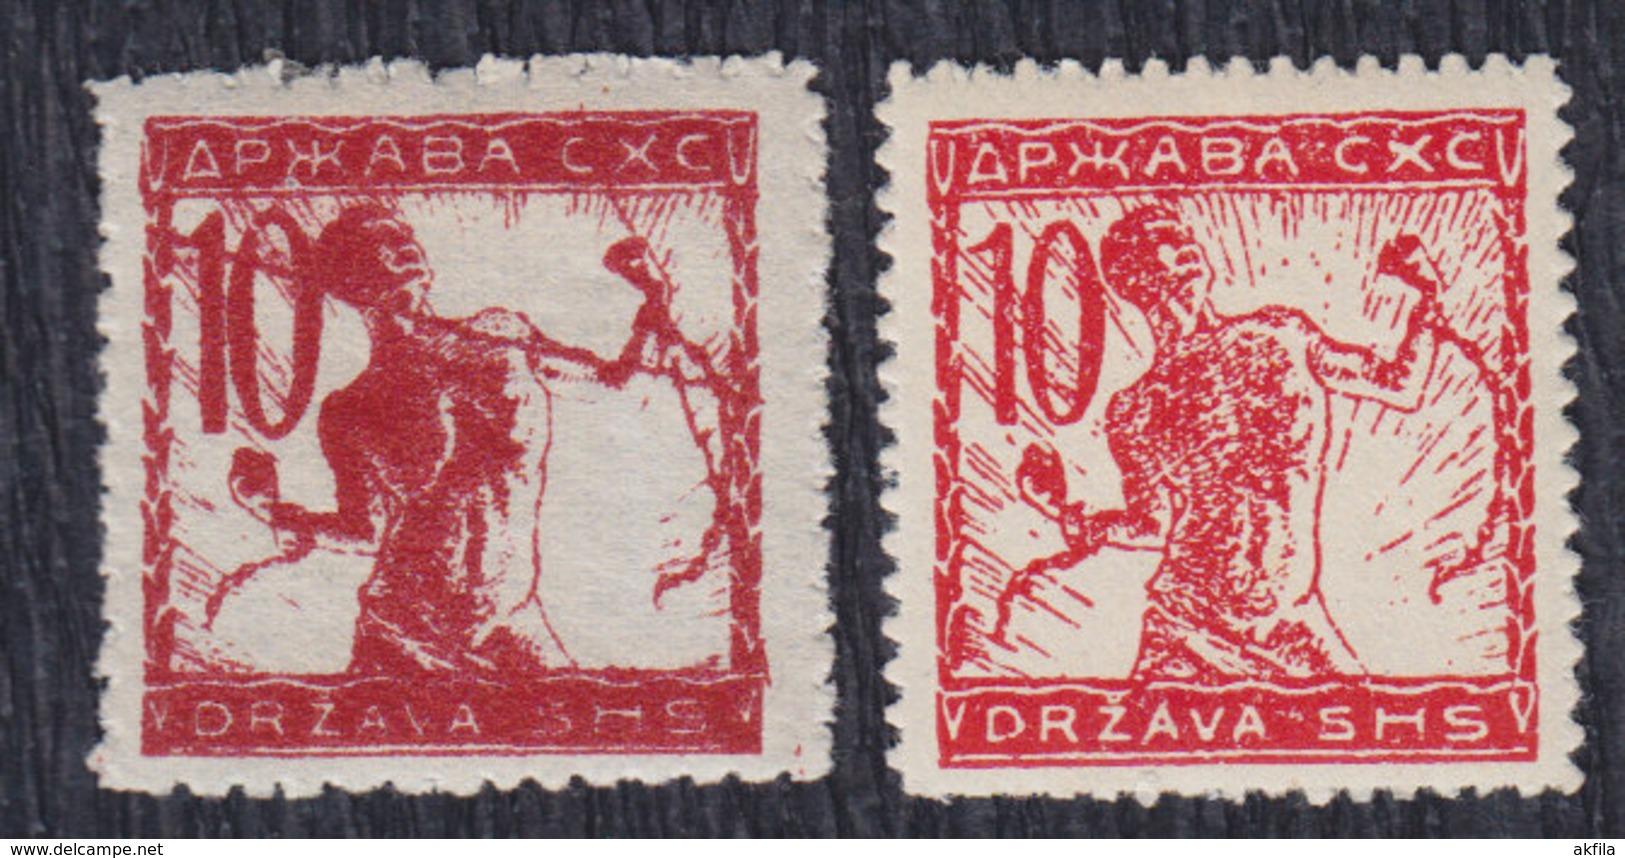 Yugoslavia State SHS Slovenia 1919 Chain Breakers (Verigari) Error - Difference In Print, MH (*) Michel 101 - Imperforates, Proofs & Errors